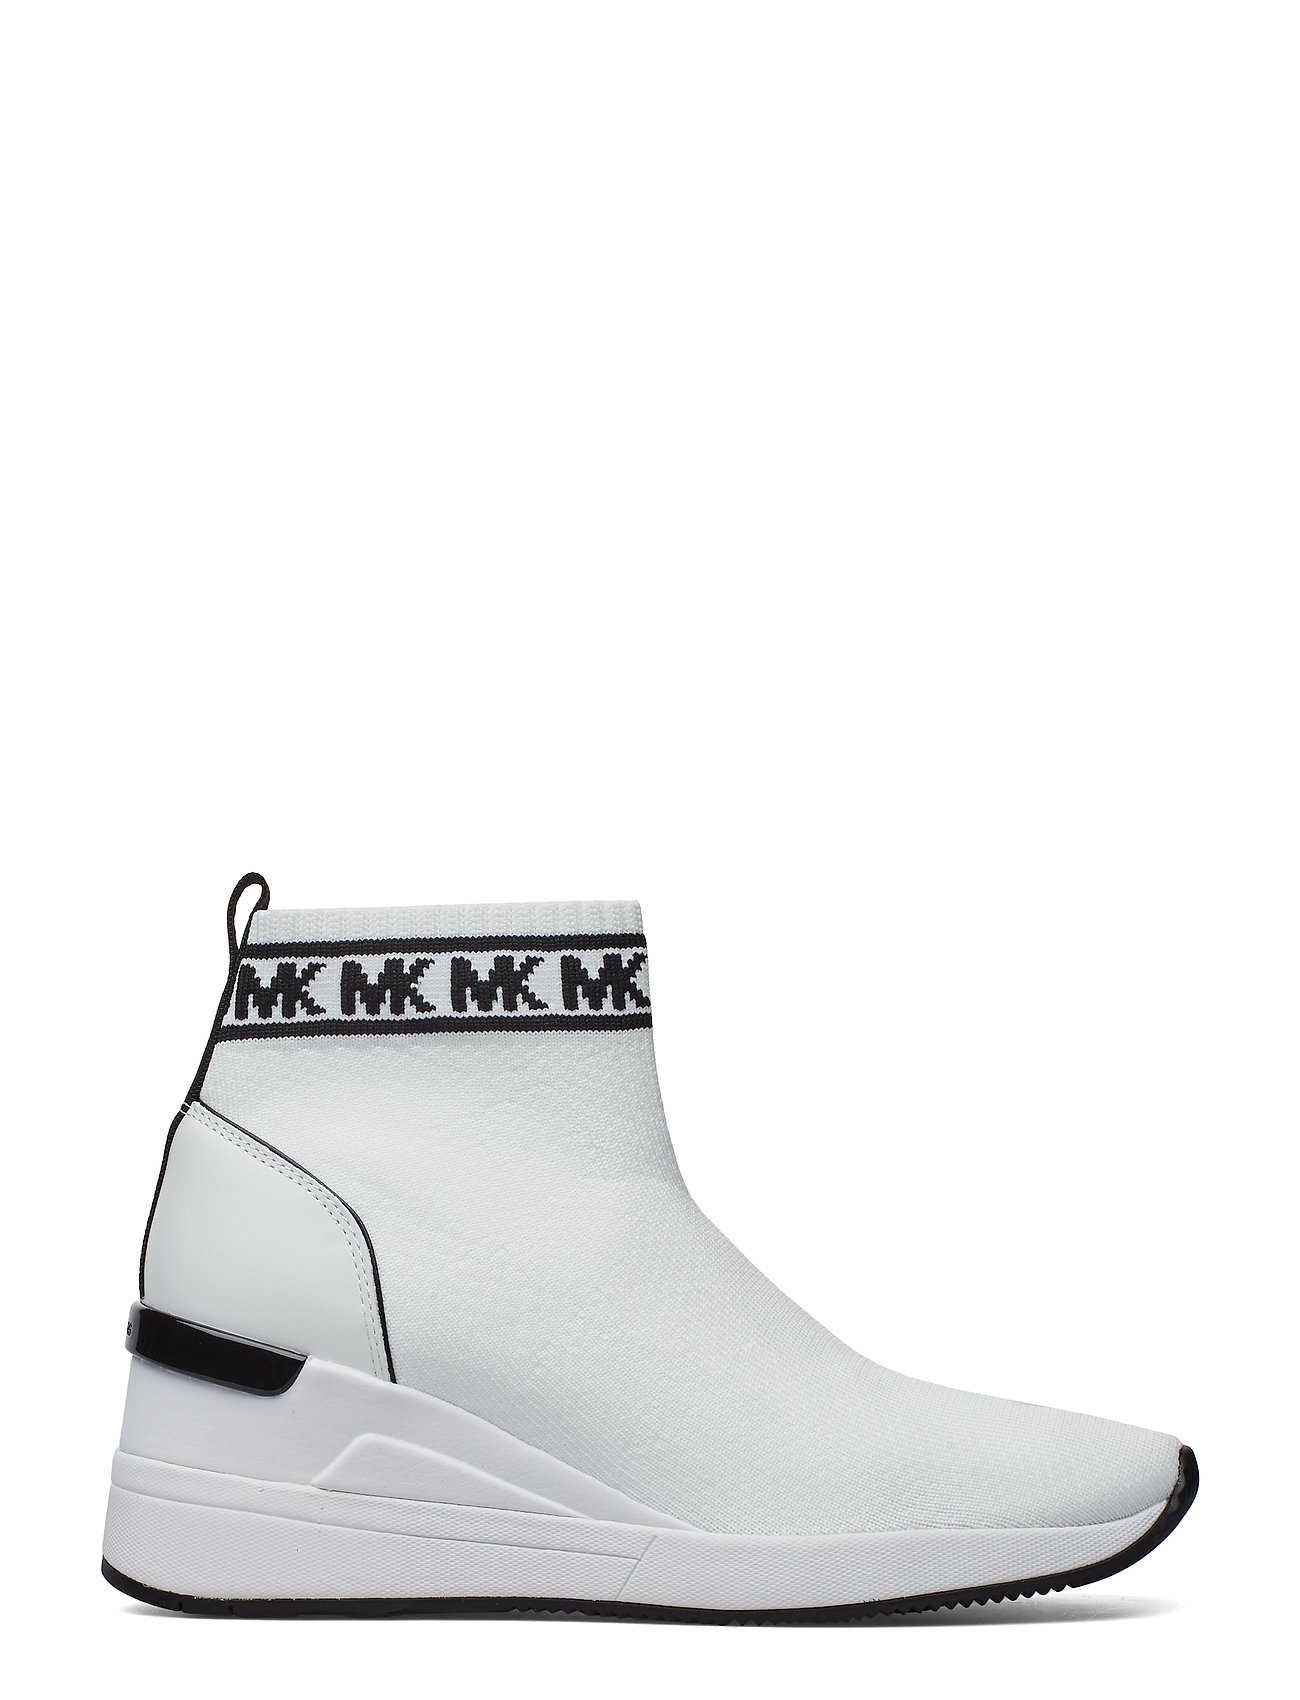 Skyler Shoes Shoes Kors Skyler blkMichael blkMichael Bootieopticwht Kors Bootieopticwht 4RqA3jL5